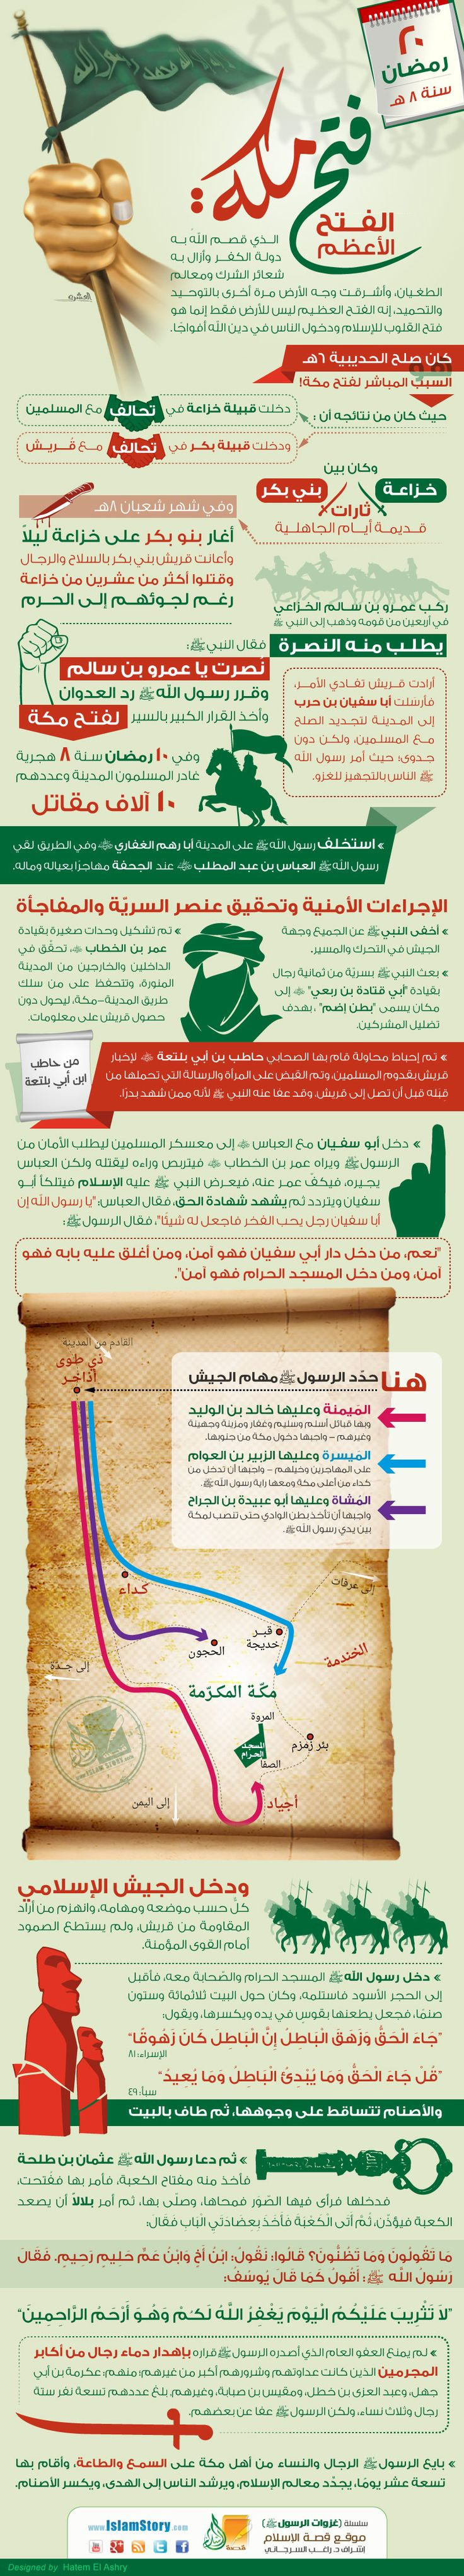 http://lite.islamstory.com/wp-content/uploads/2015/07/fath-meka.jpg